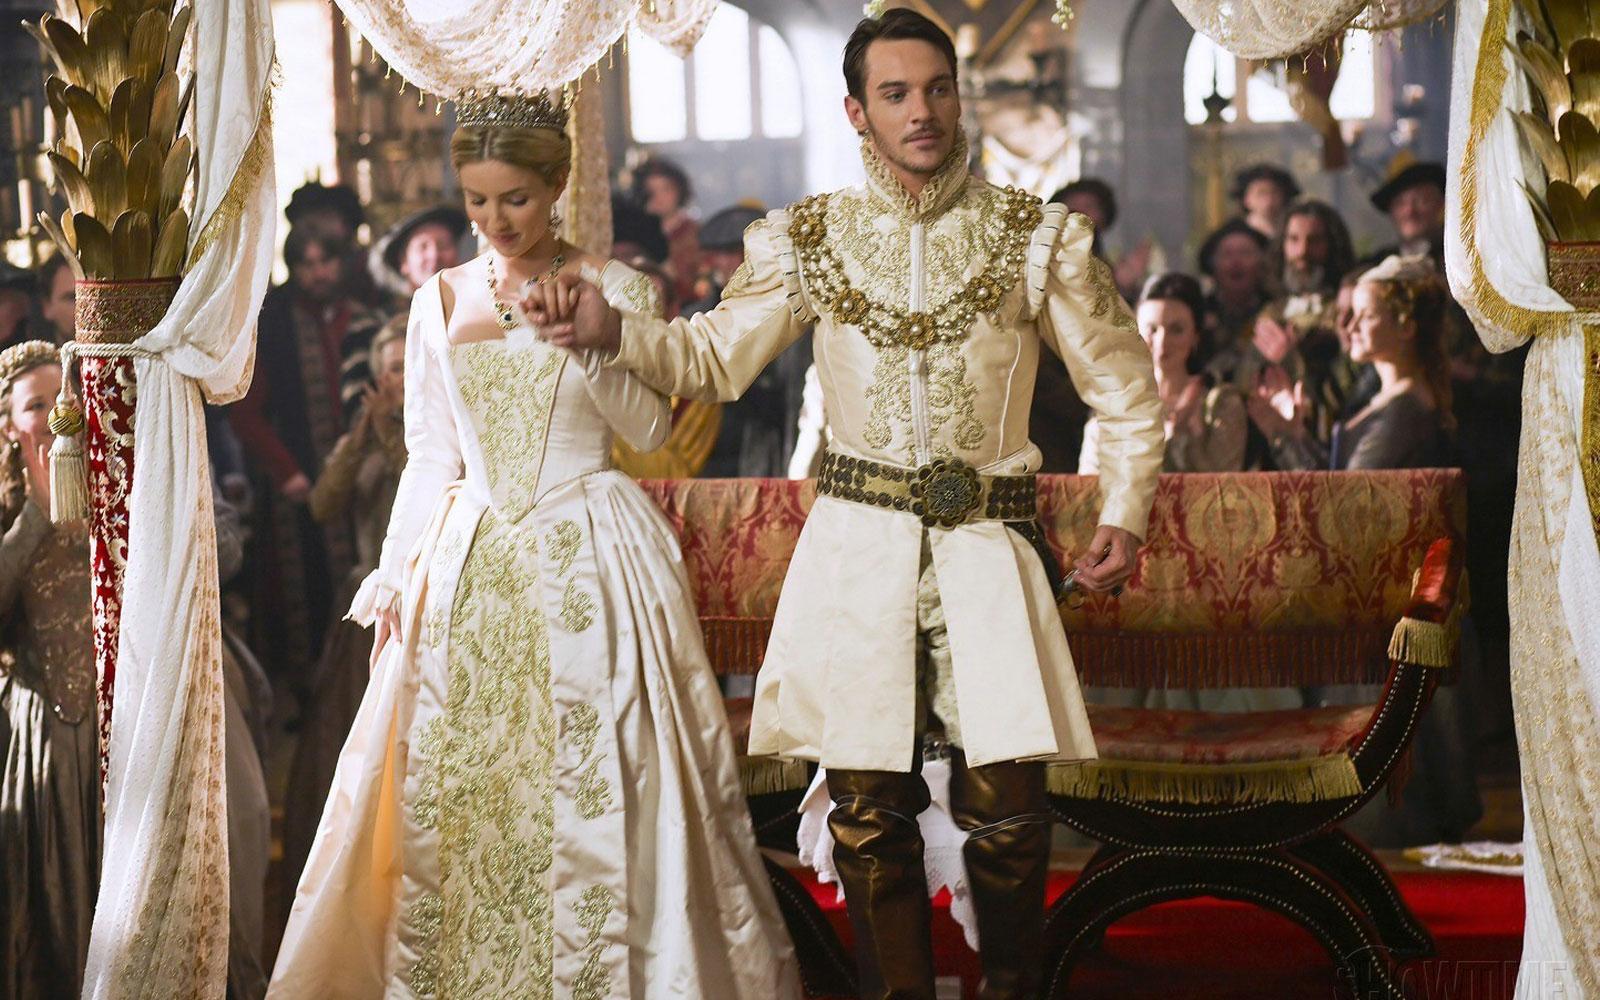 Jane Seymour a Tudorok sorozatban